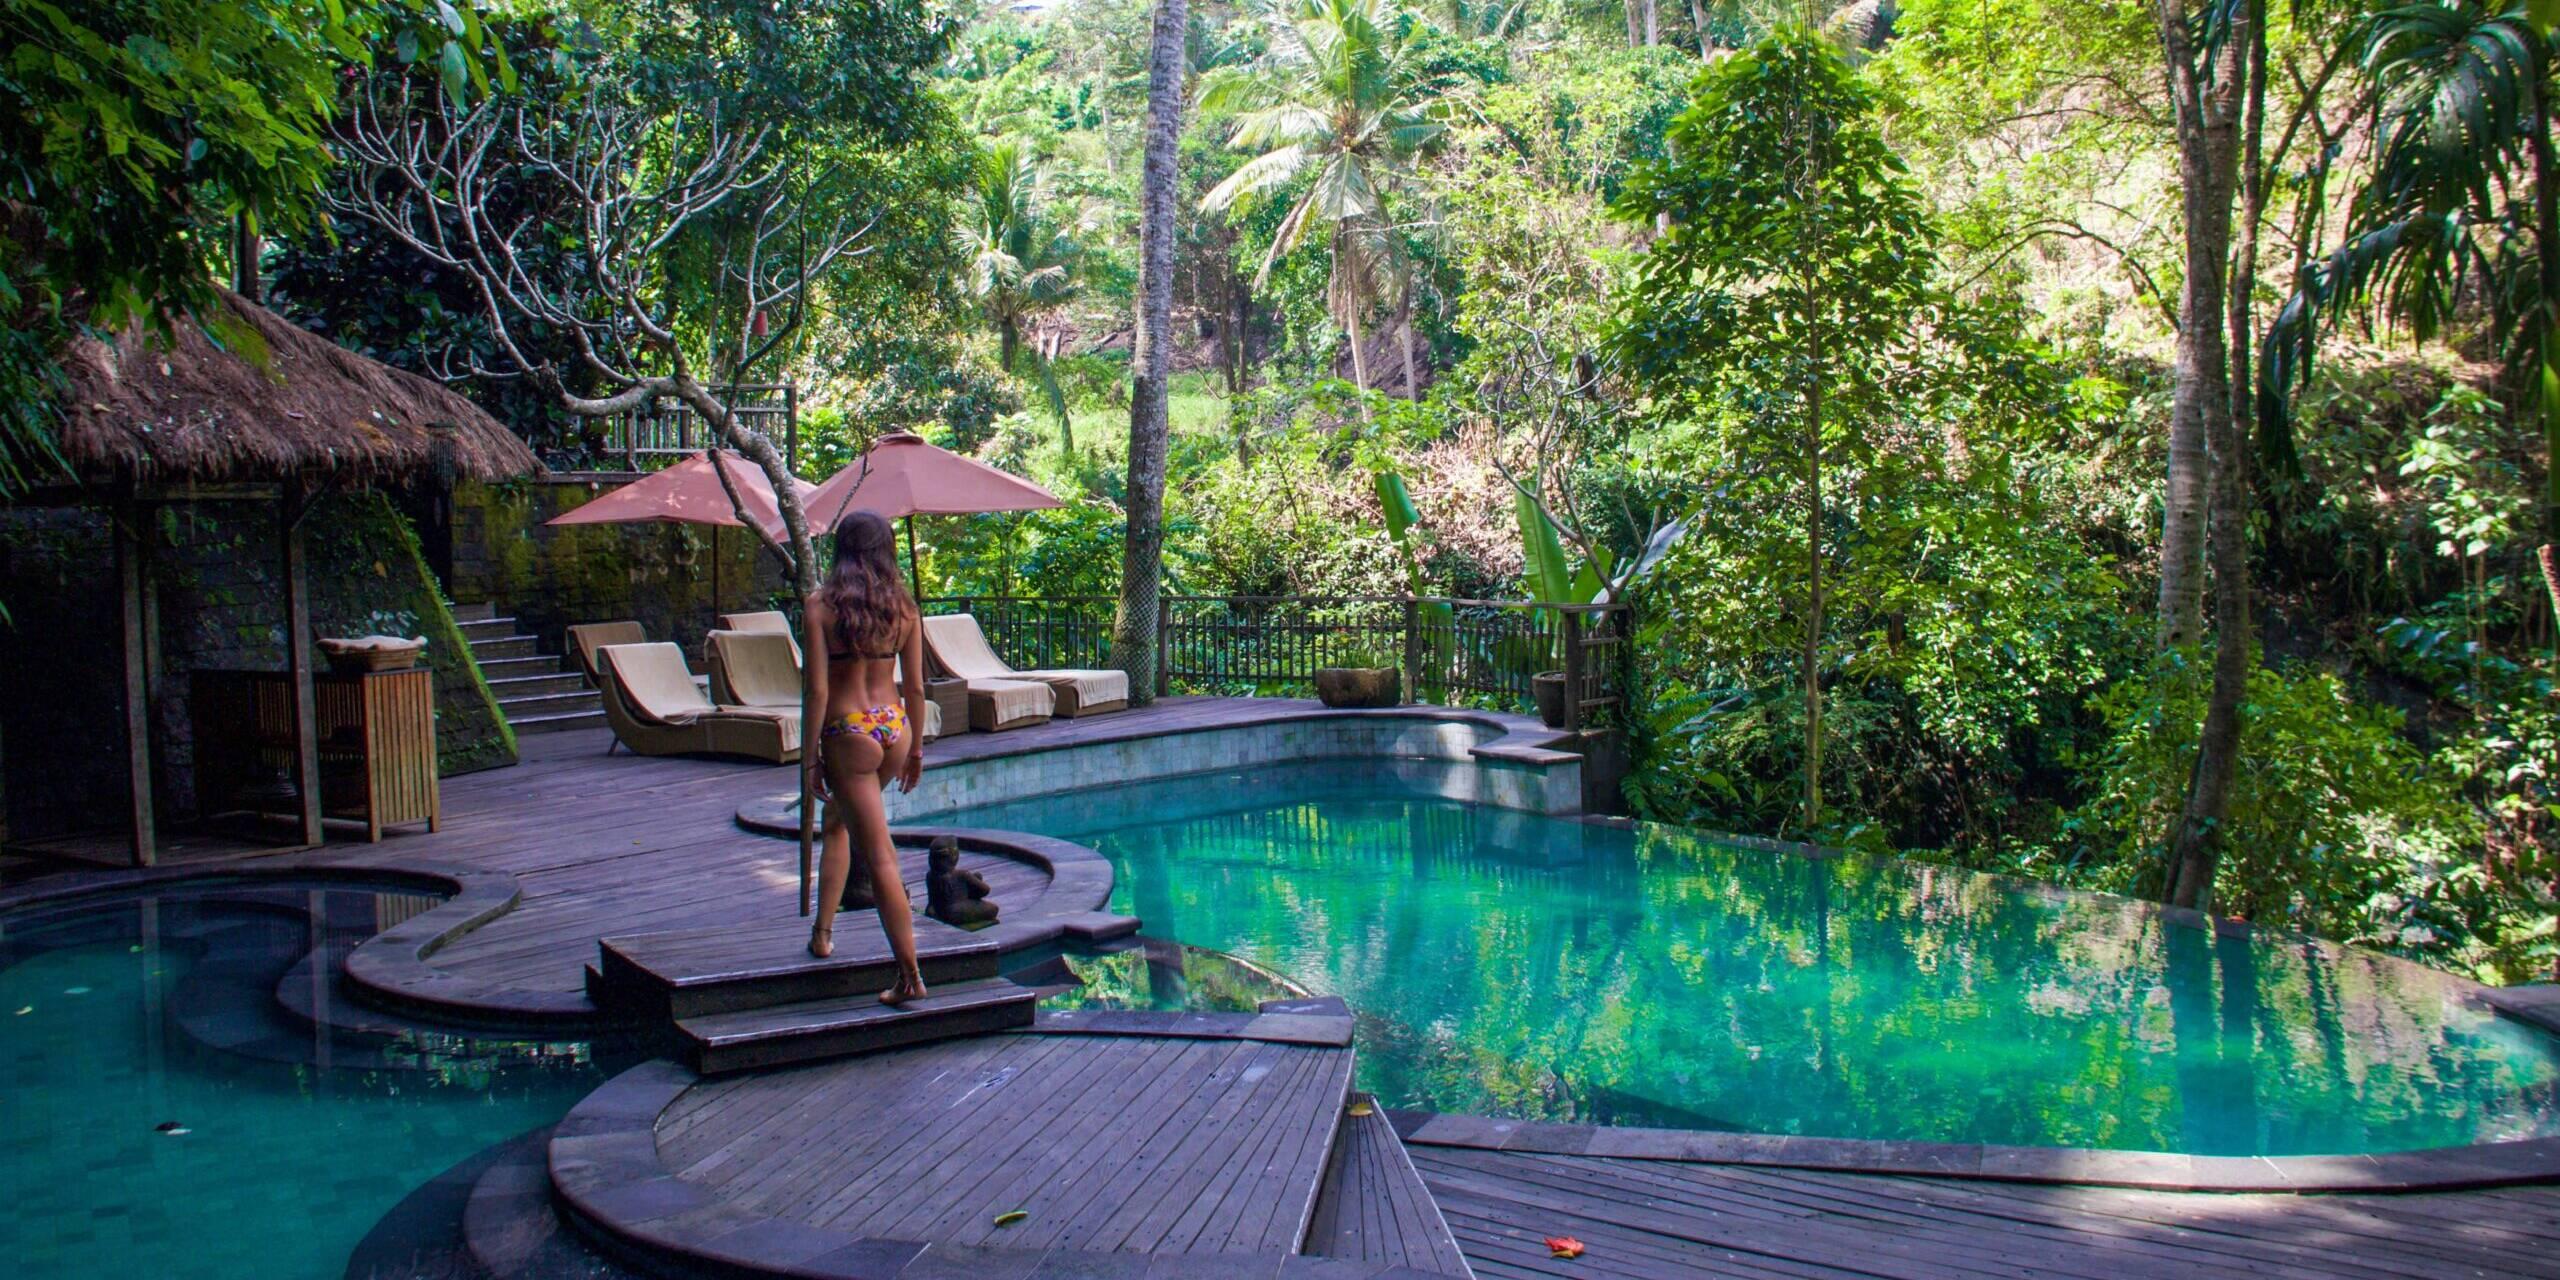 Infinity pool at Svarga Loka resort in Ubud